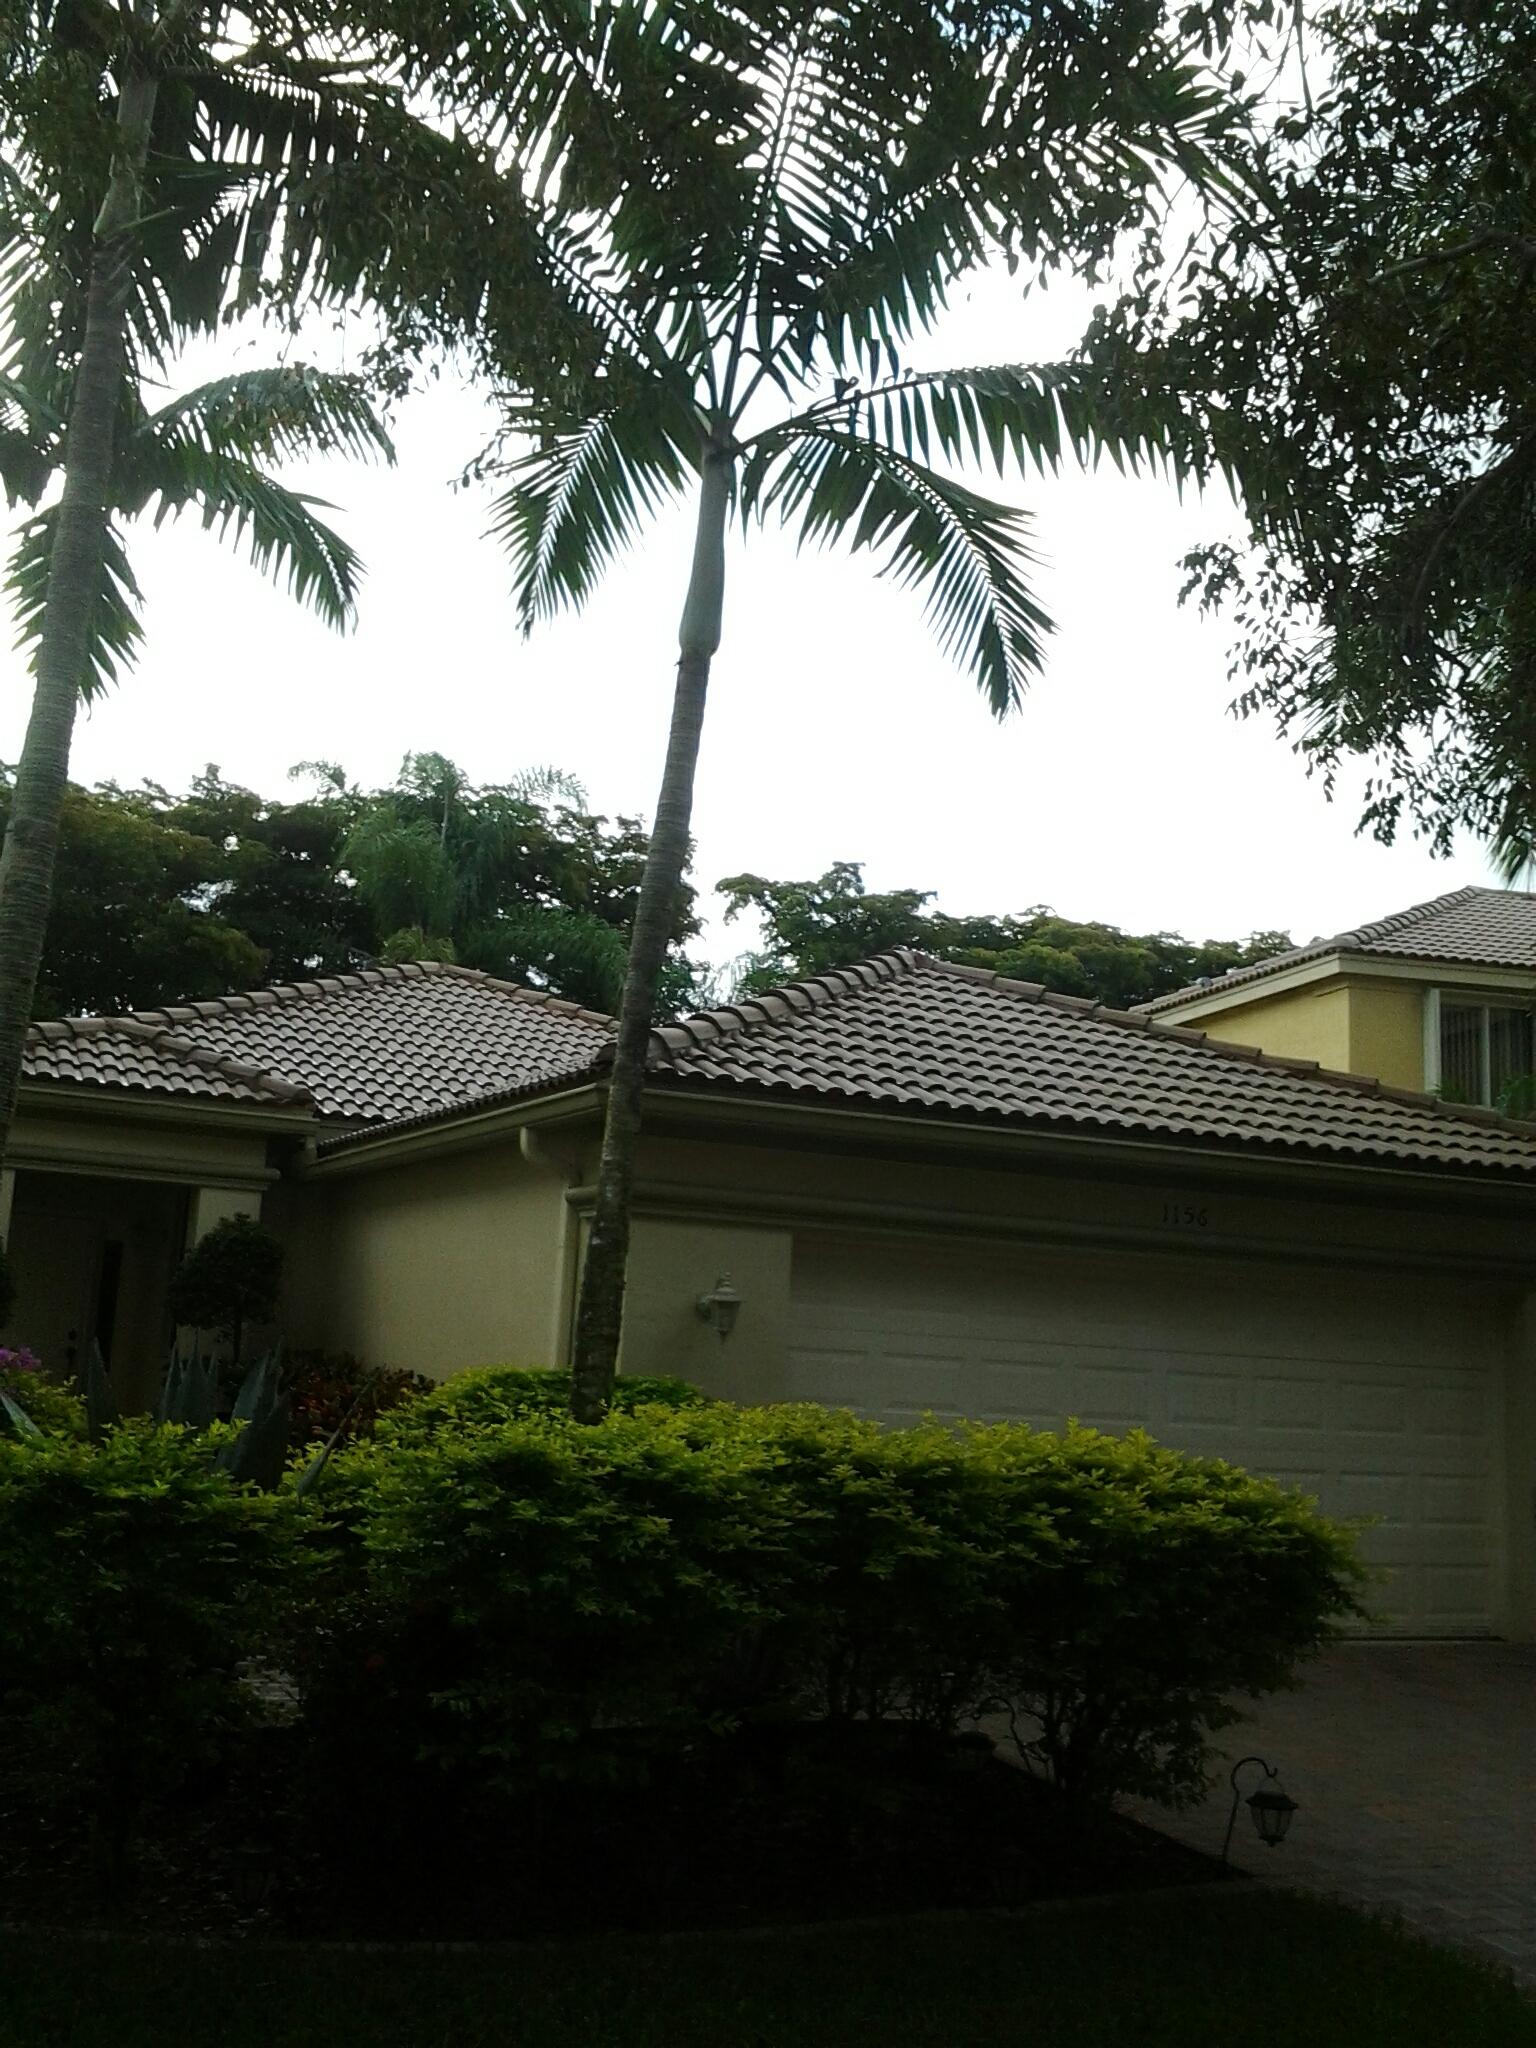 Weston, FL - Roofacide roof